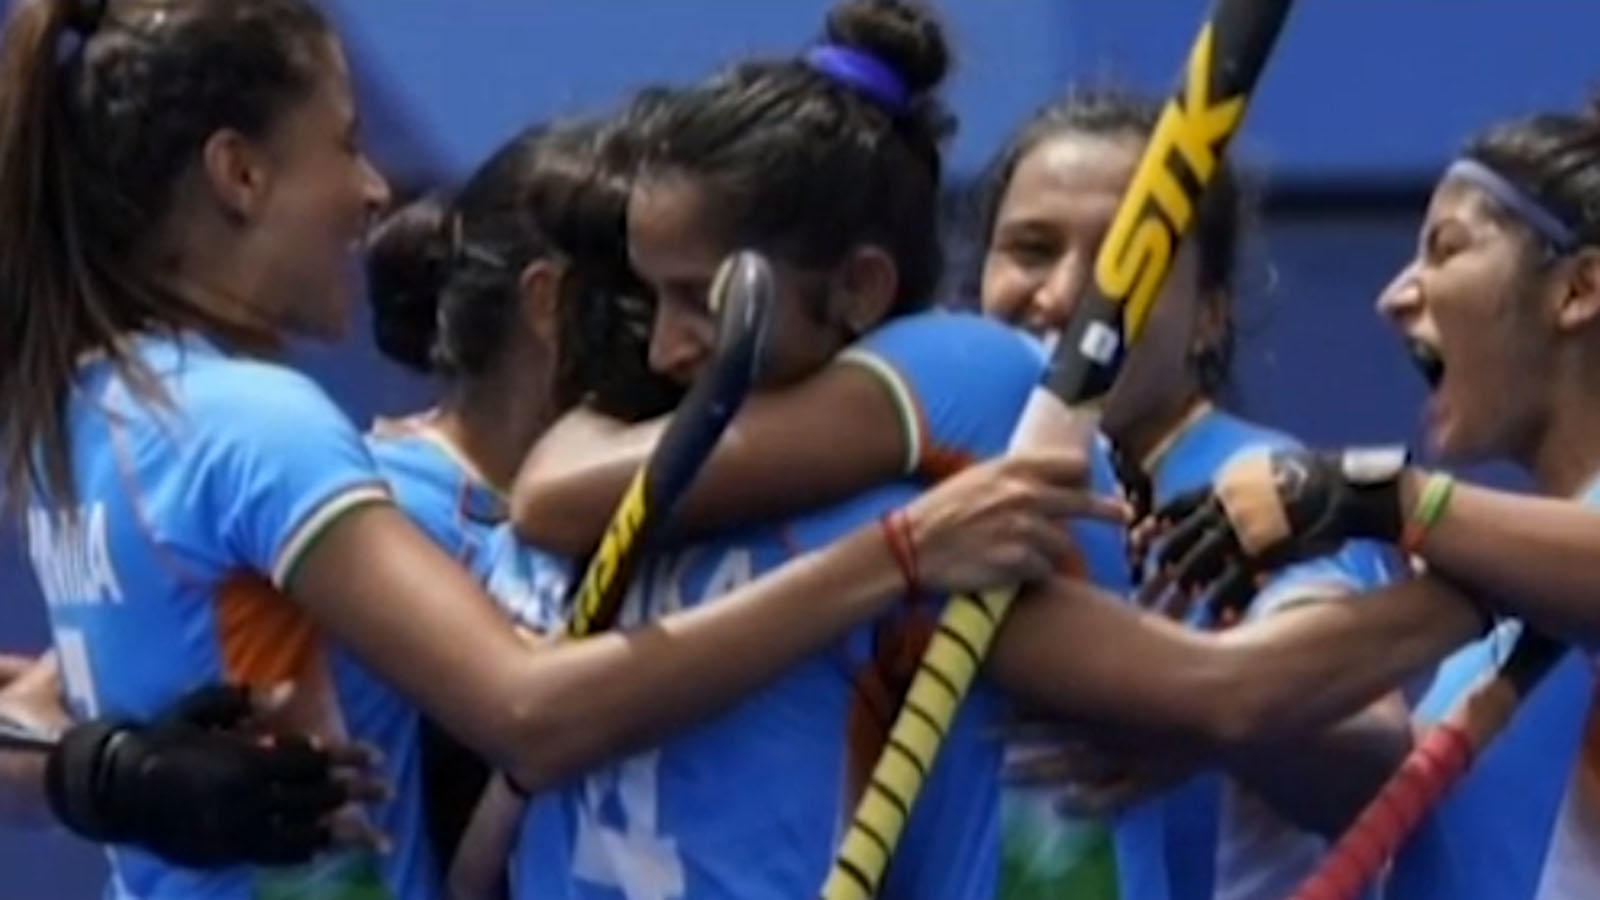 tokyo-olympics-2020-india-women-hockey-team-beat-australia-1-0-to-enter-semis